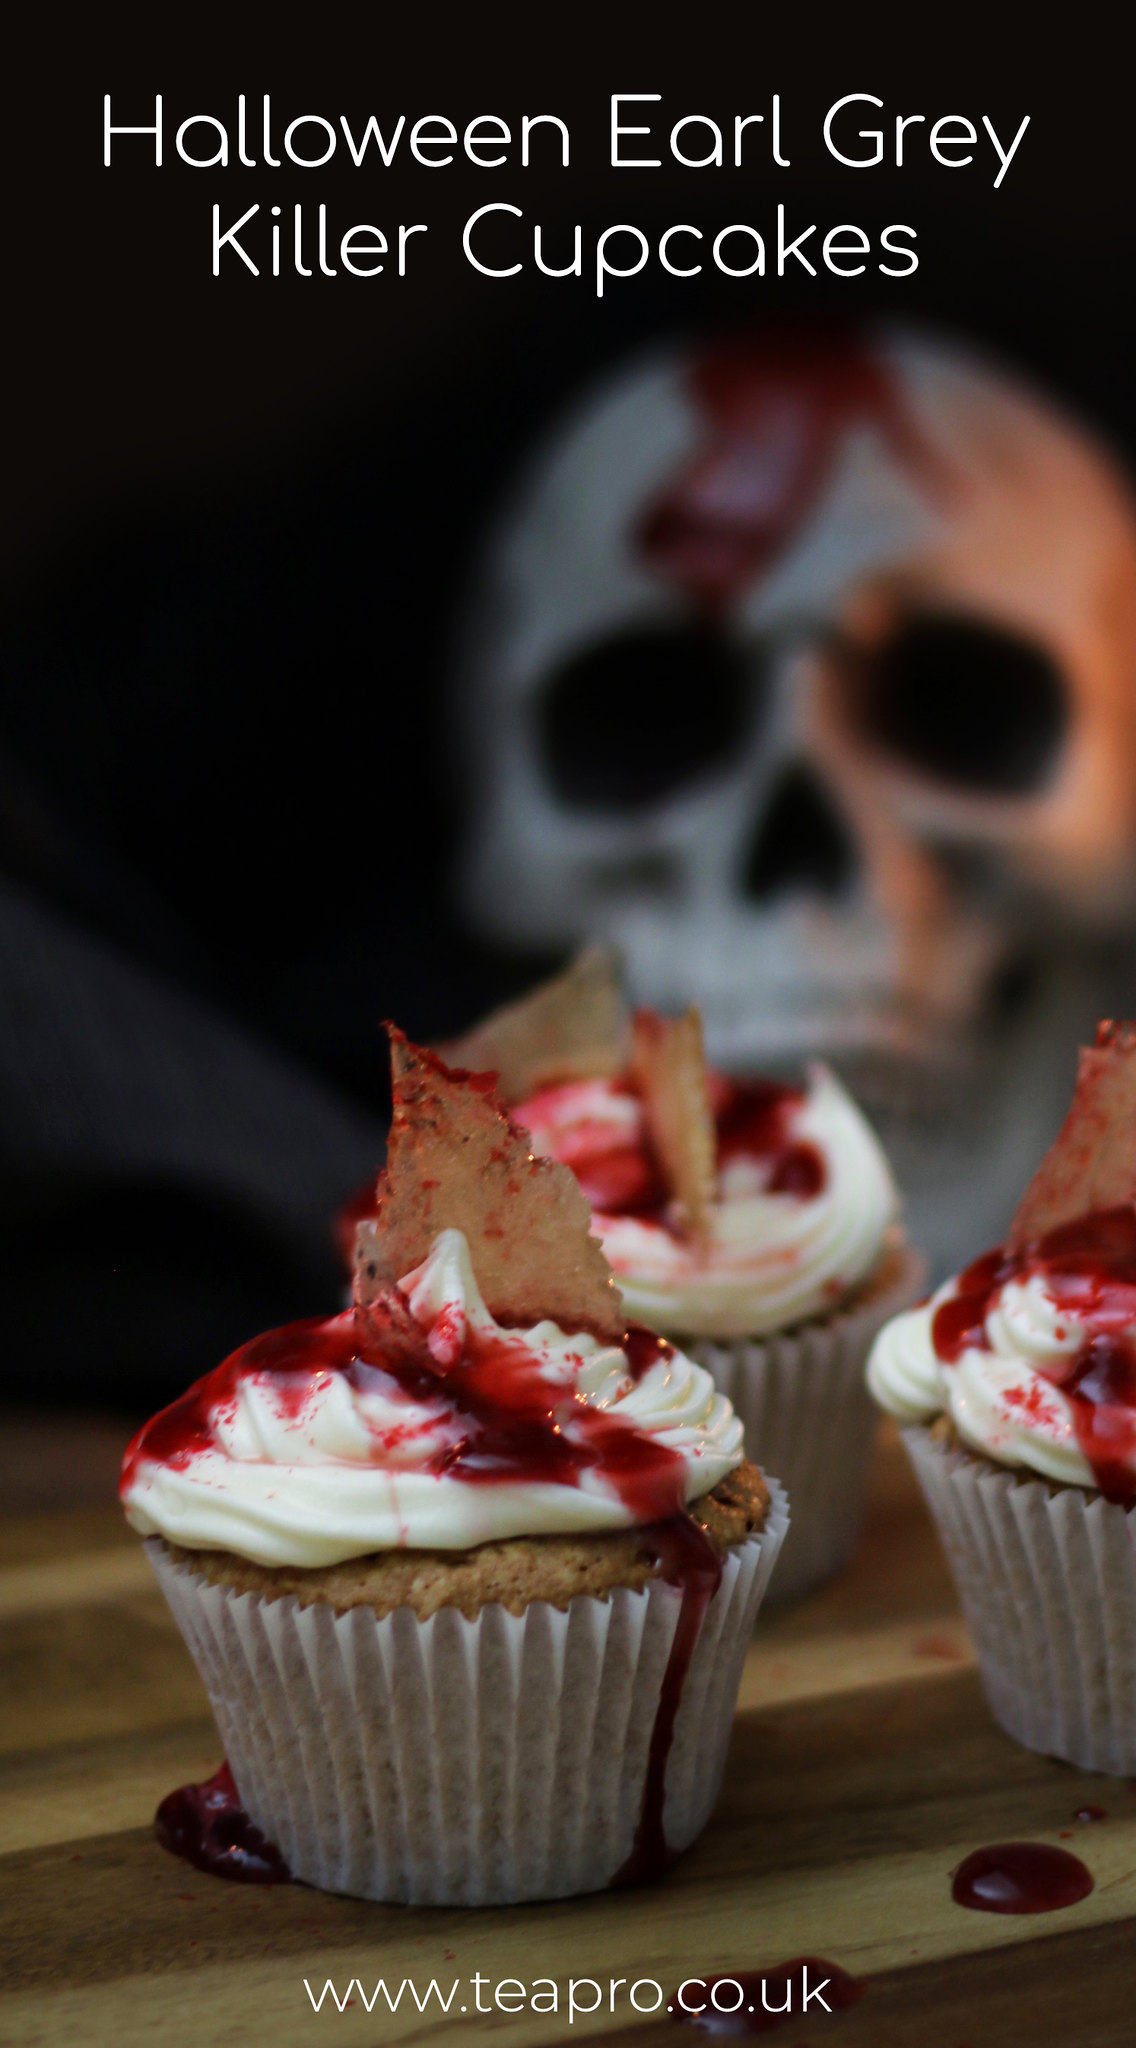 Earl-Grey-Killer-cupcakes